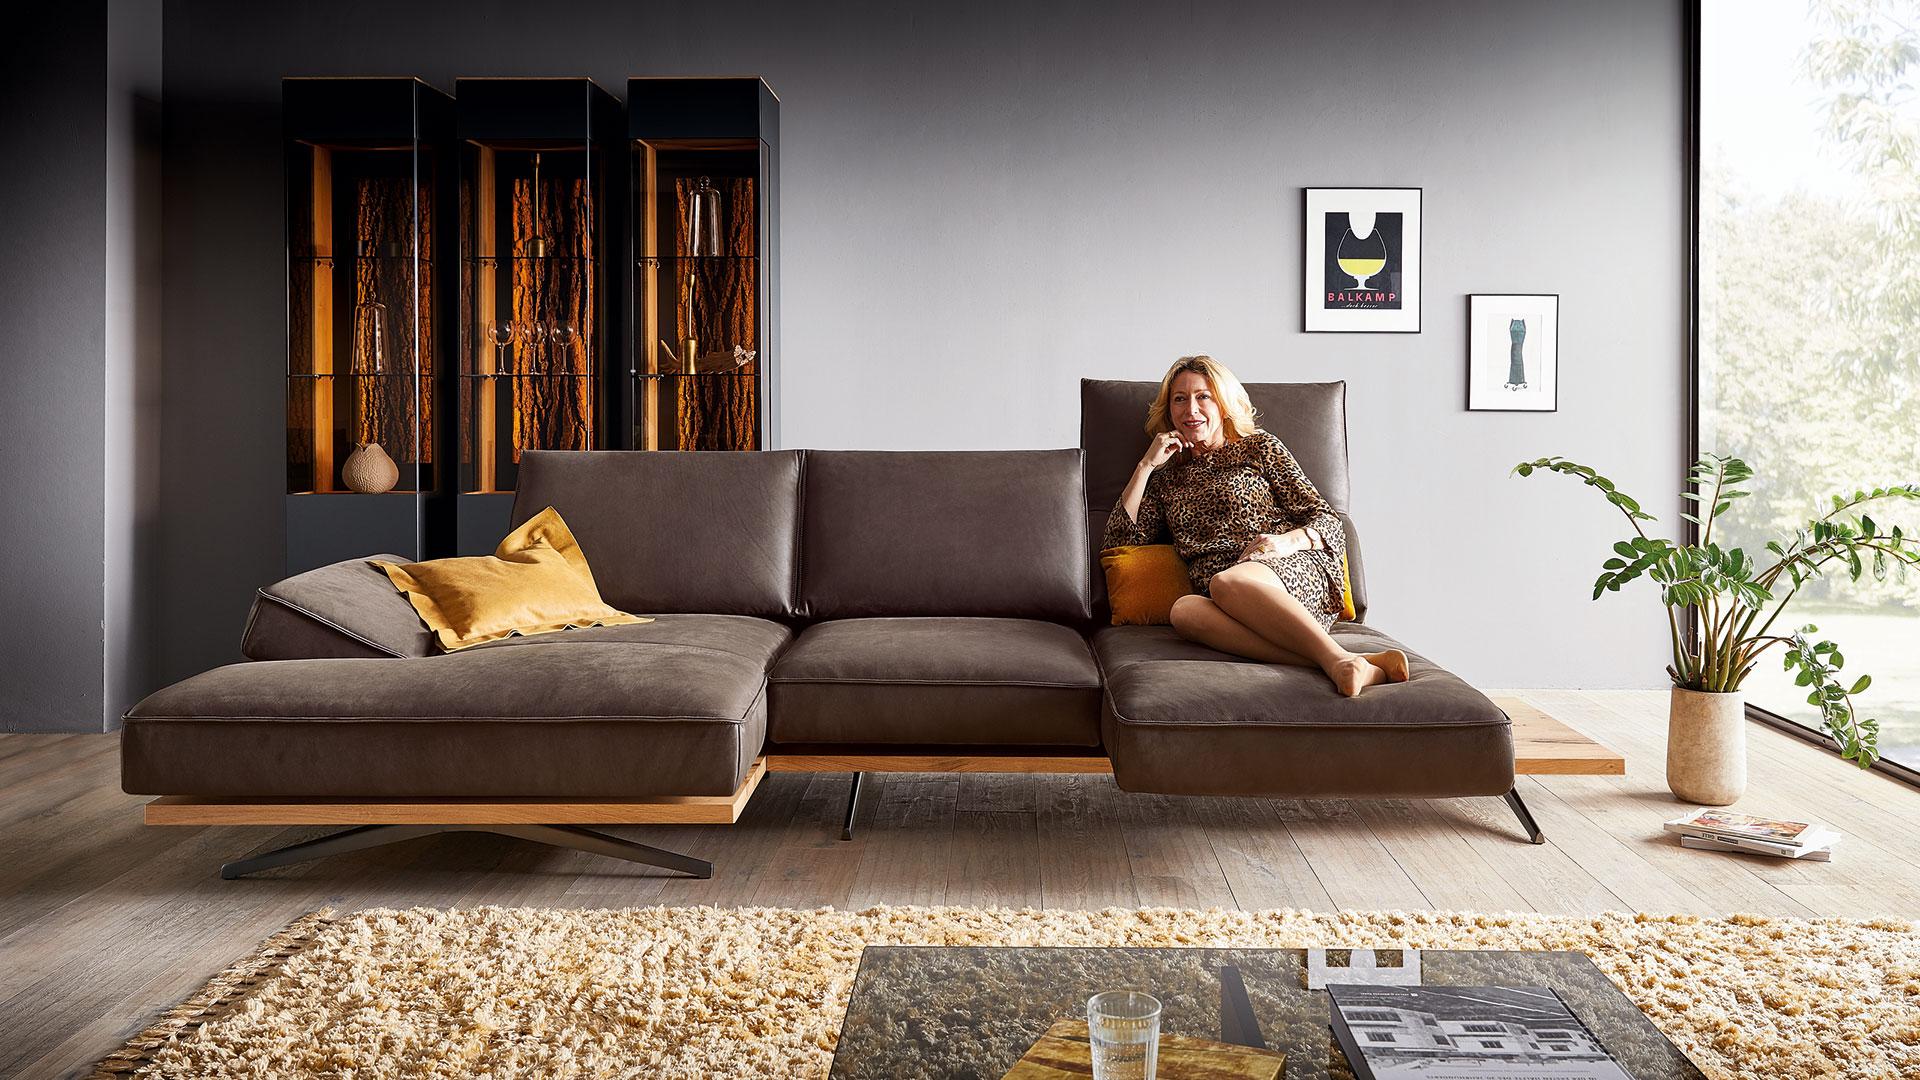 Full Size of Koinor Sofa Couch Gebraucht Leder Francis Schwarz Kaufen Lederfarben Outlet Grau 2 Sitzer Preisliste Big Mit Hocker Sitzsack Braun Antik Megapol Blau Sofa Koinor Sofa